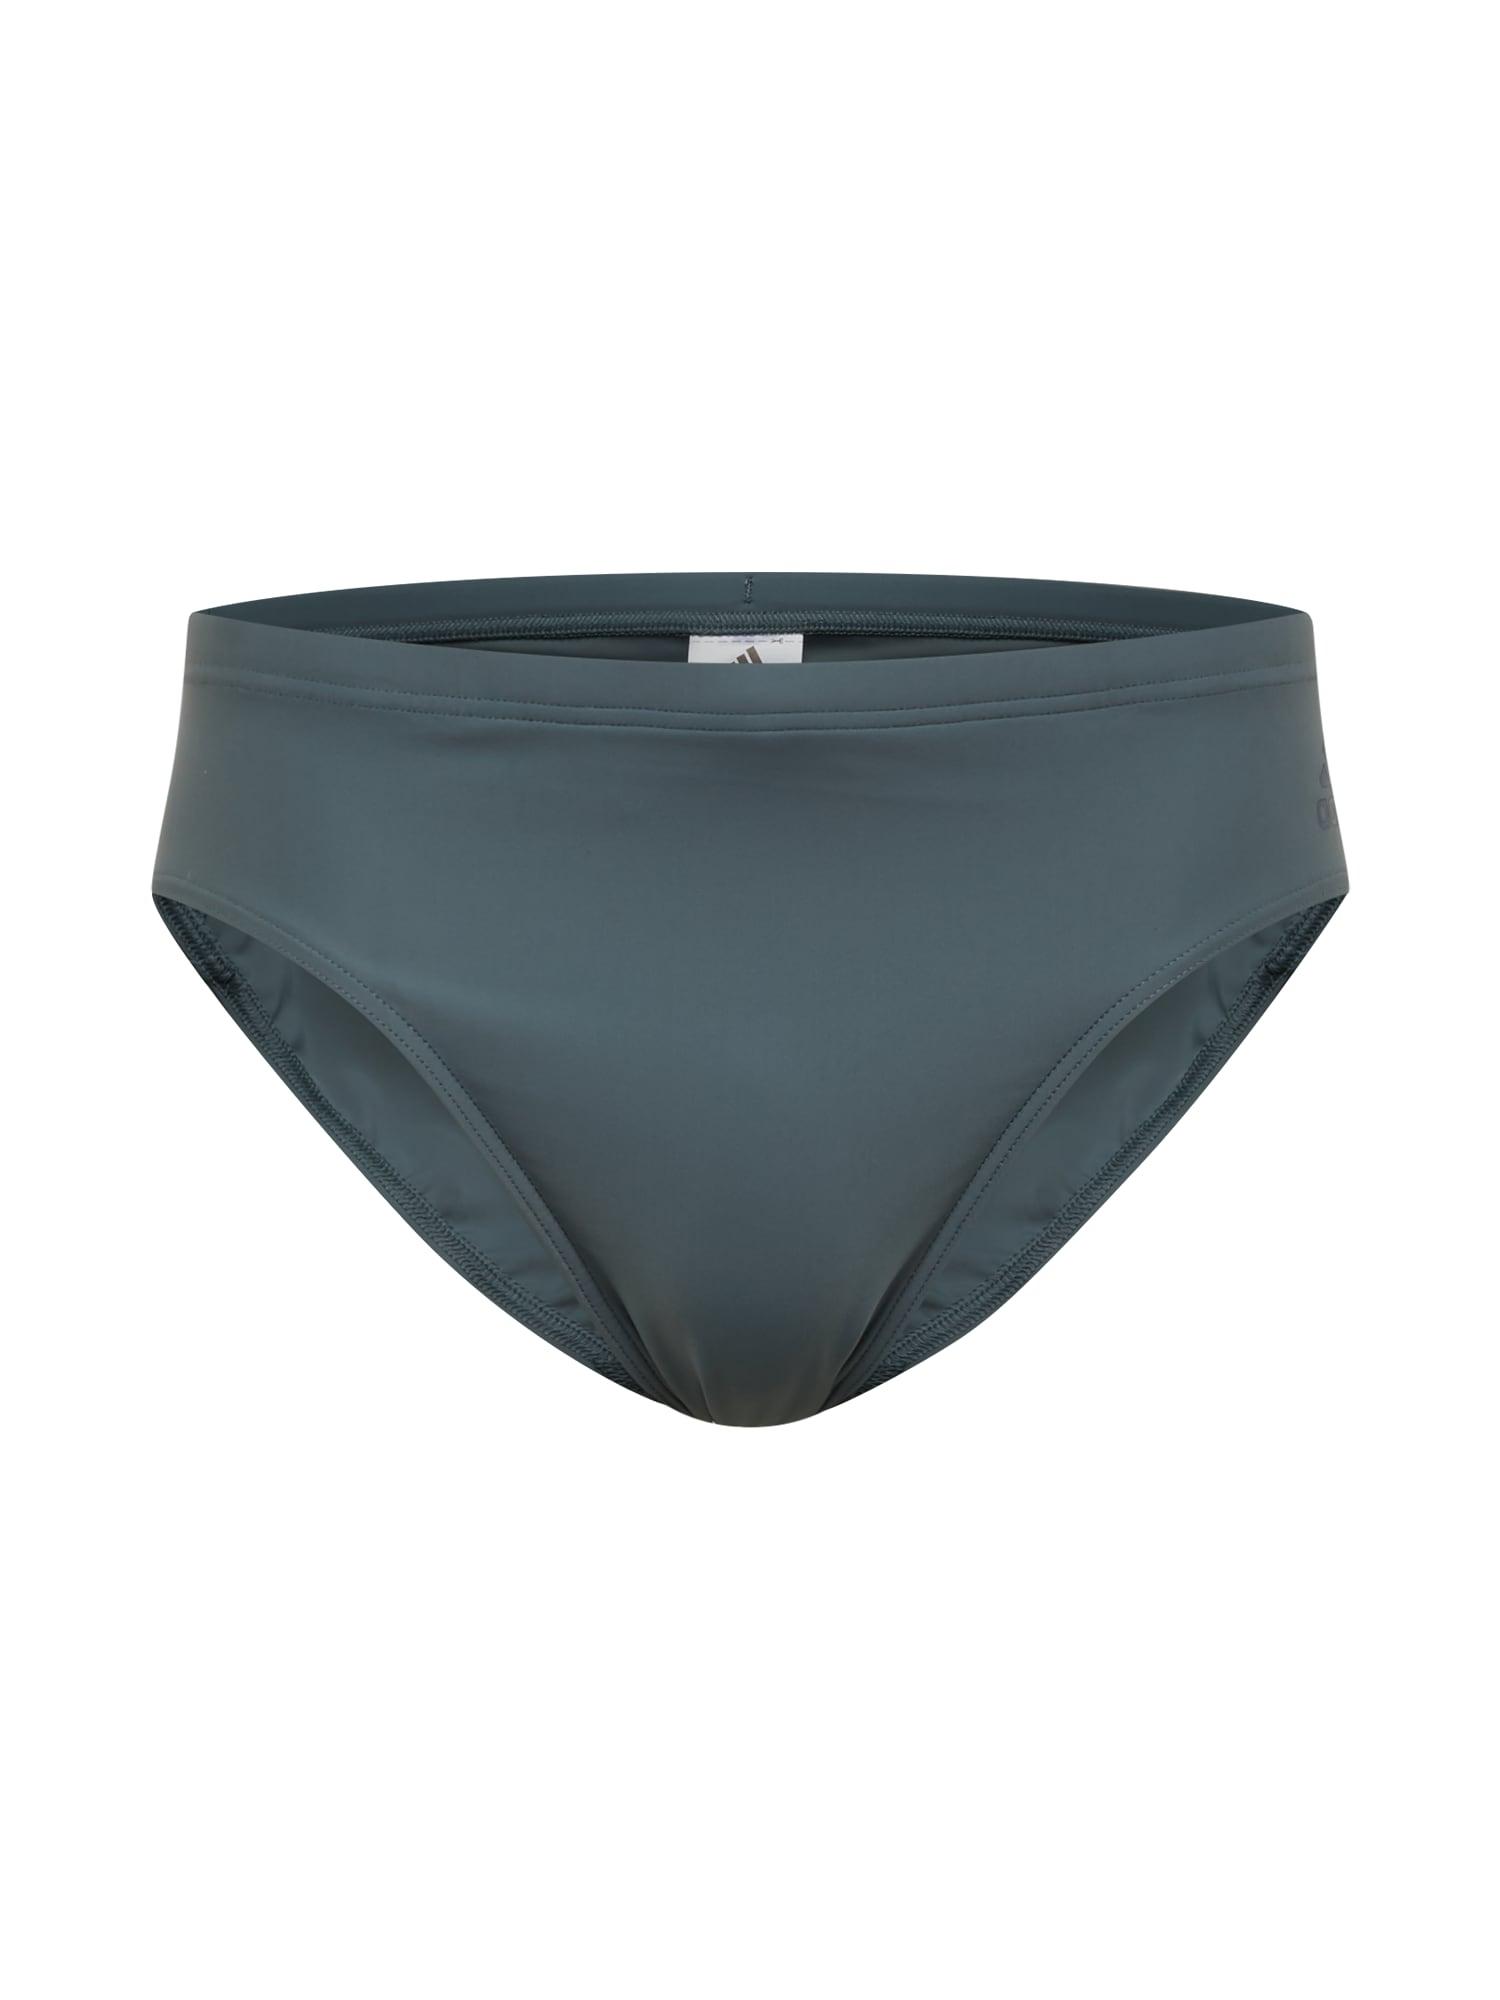 ADIDAS PERFORMANCE Maillot de bain de sport  - Bleu - Taille: 5 - male